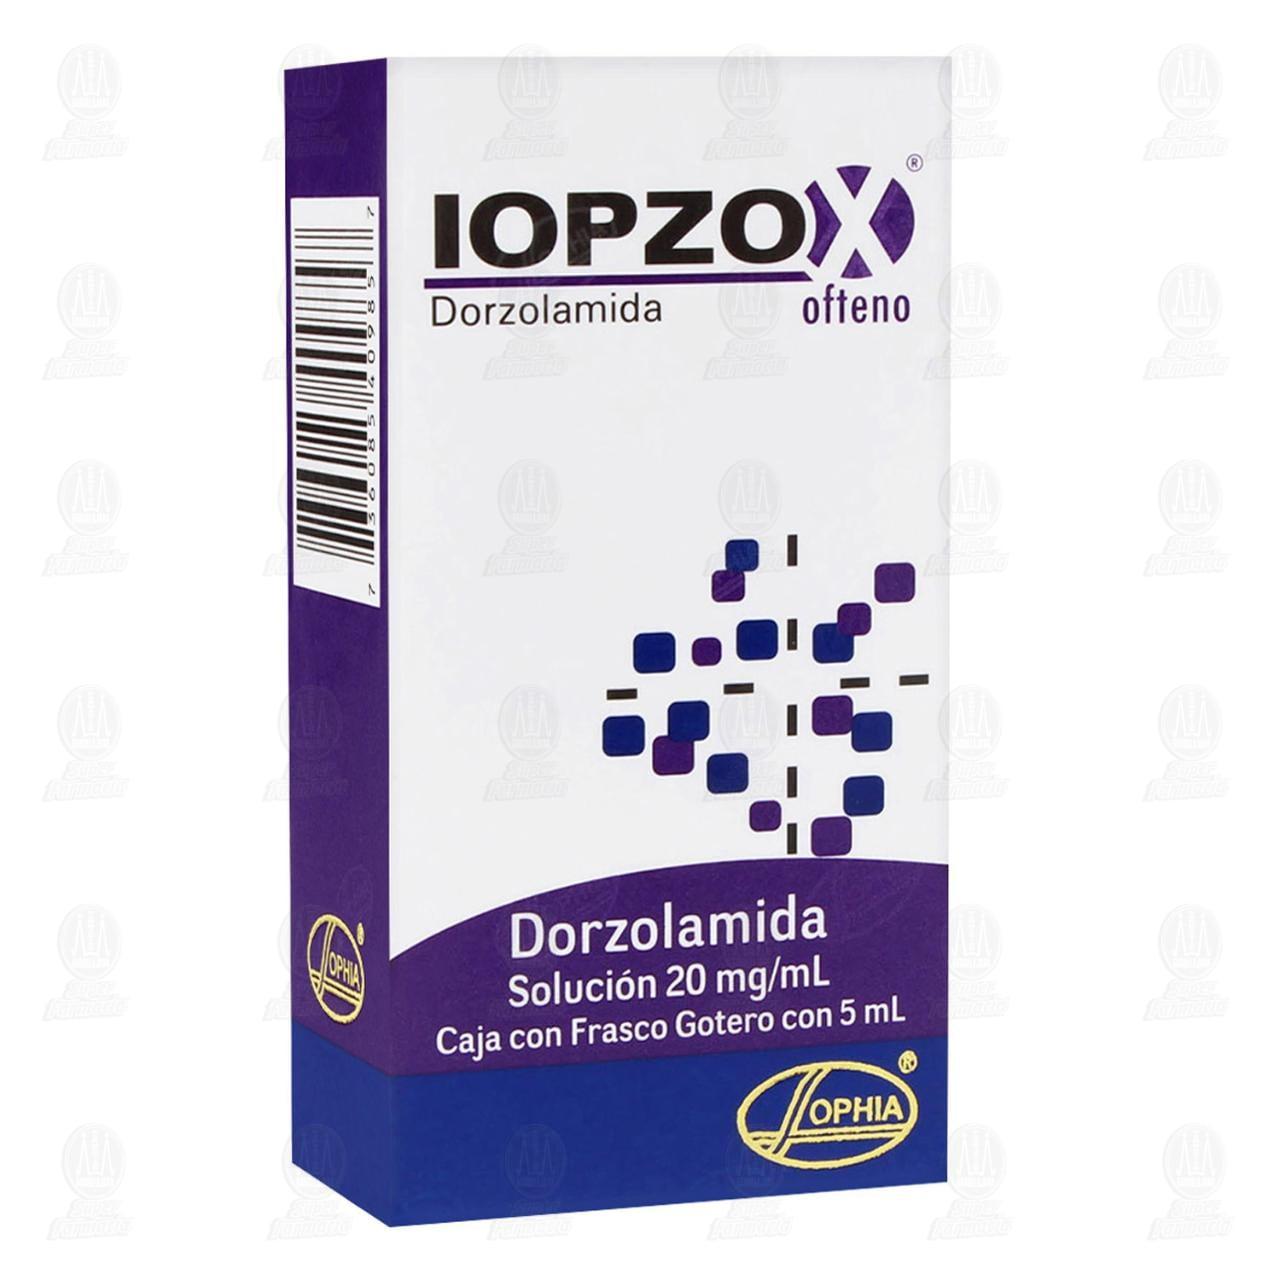 Comprar Iopzox Ofteno 20mg/ml 5ml Solución Gotas en Farmacias Guadalajara